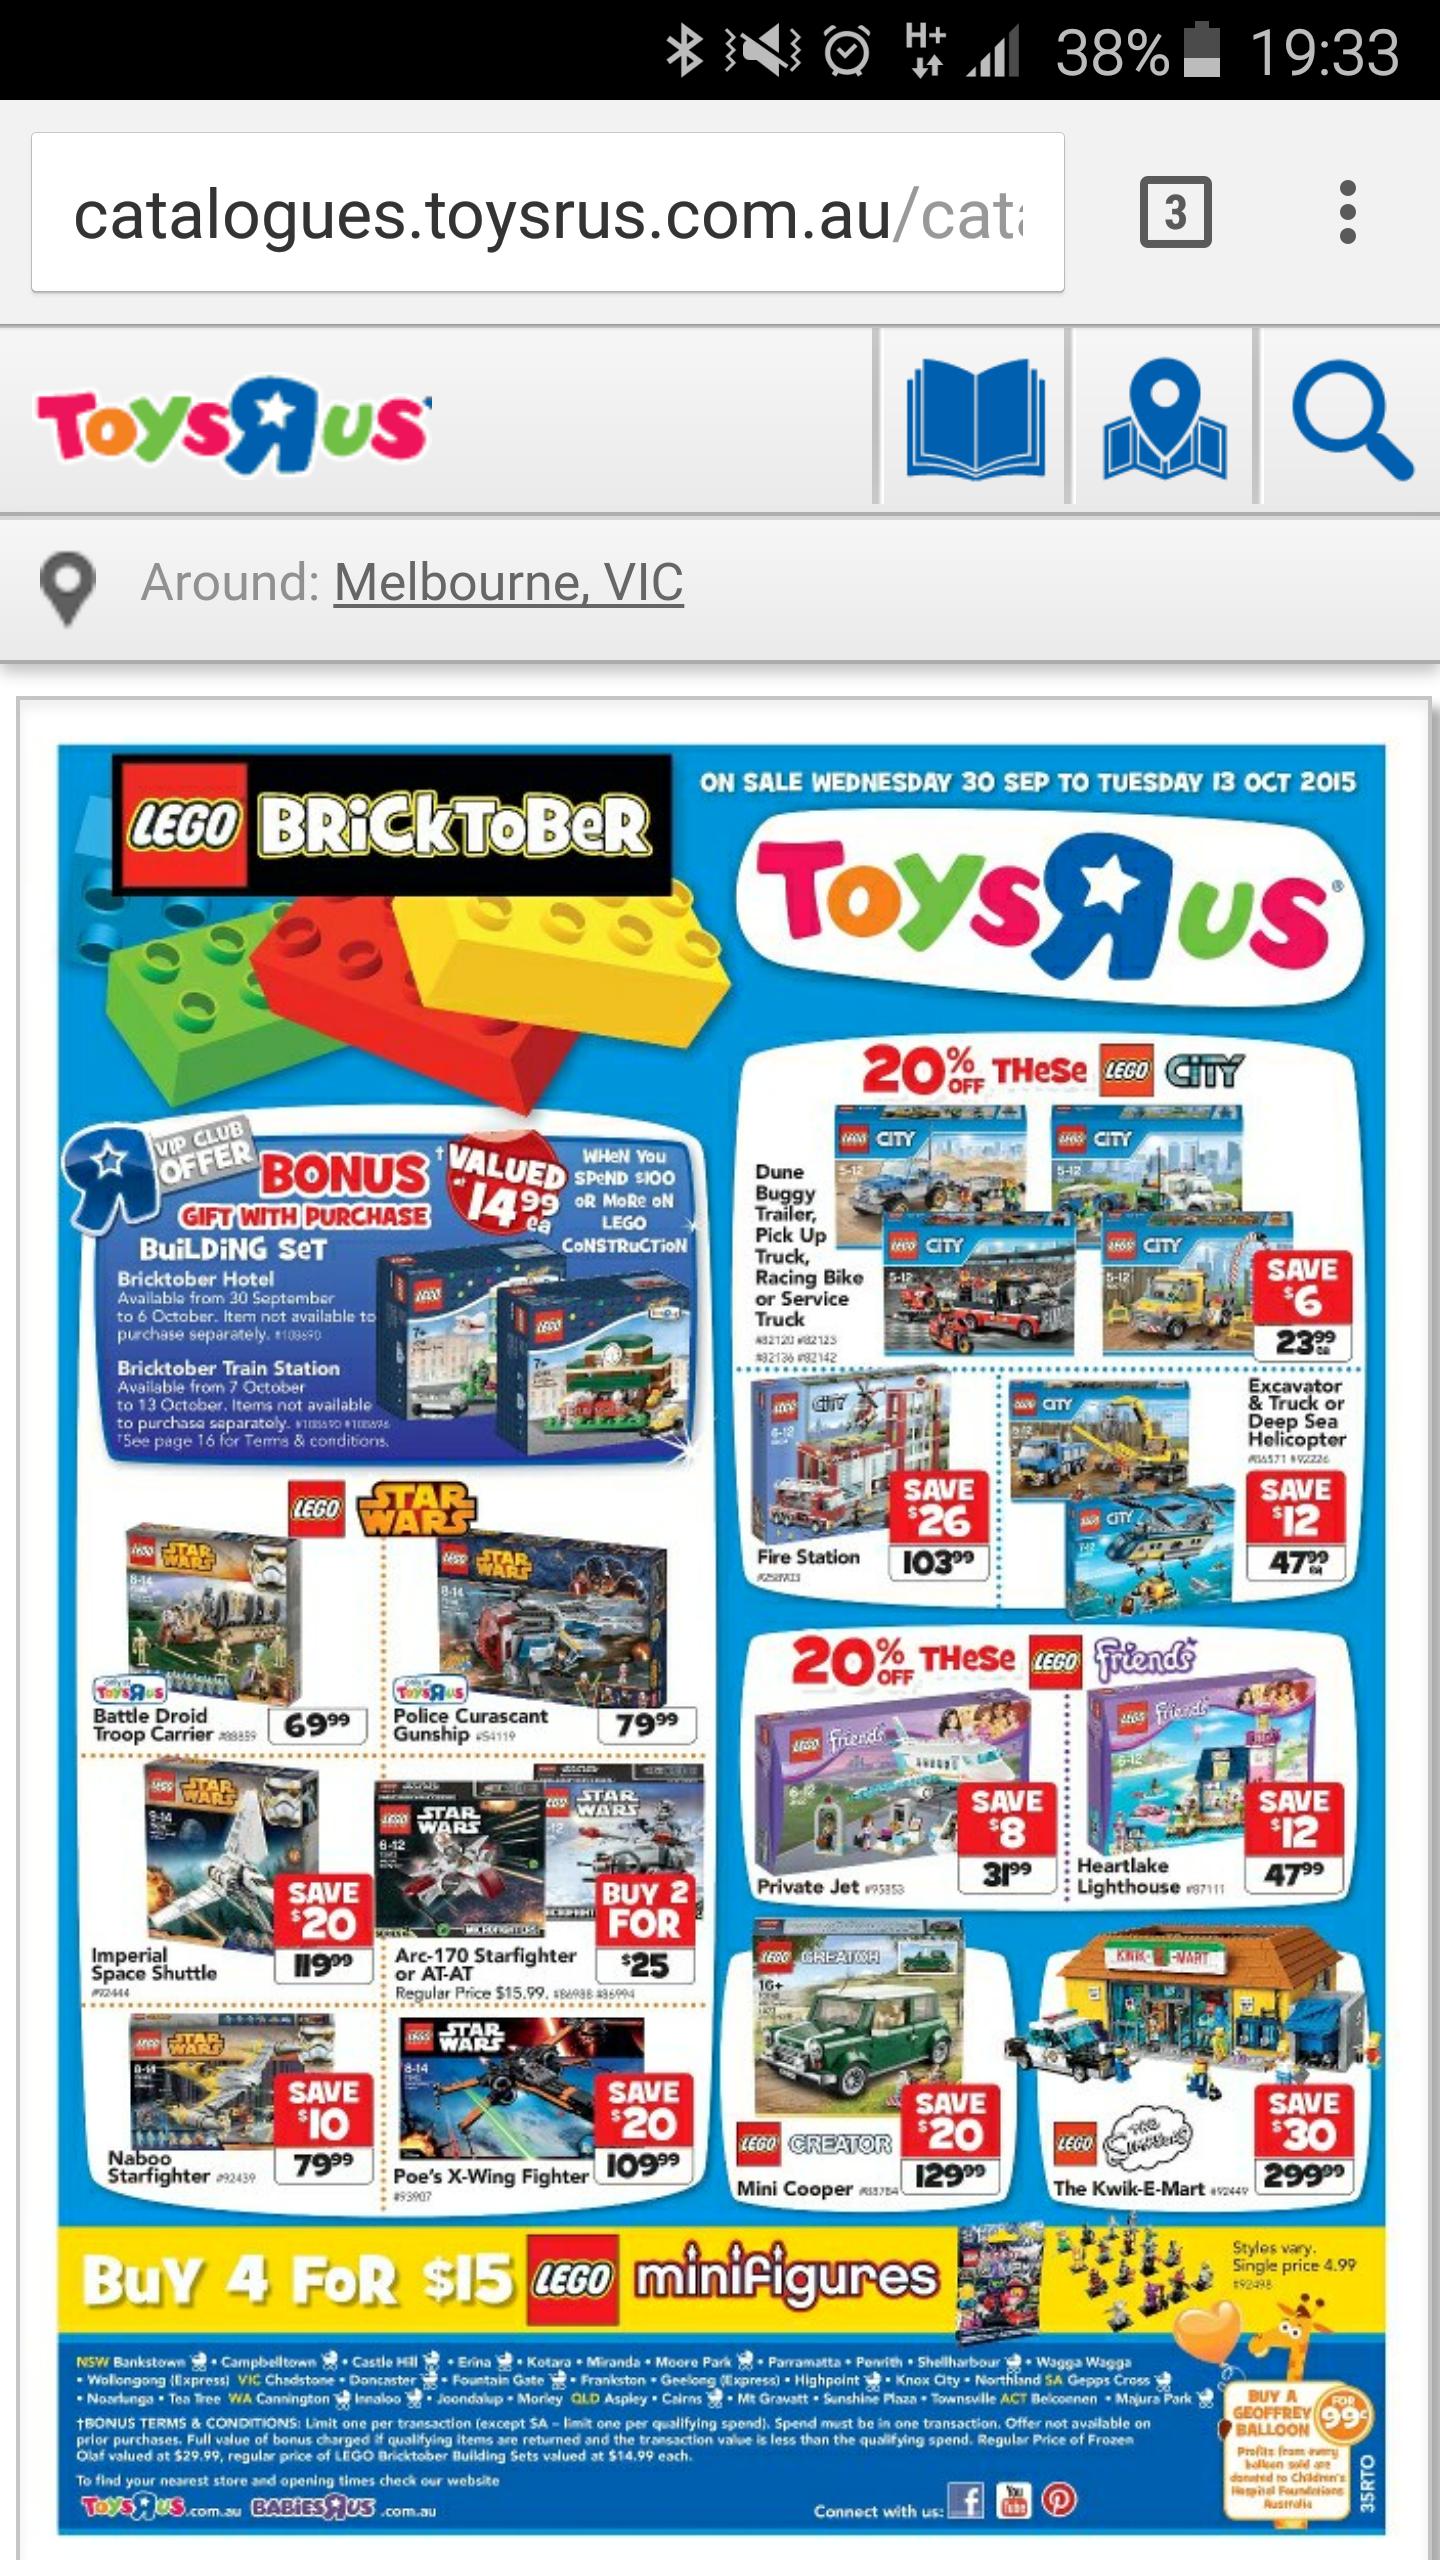 Toys r us bricktober promotional giveaways